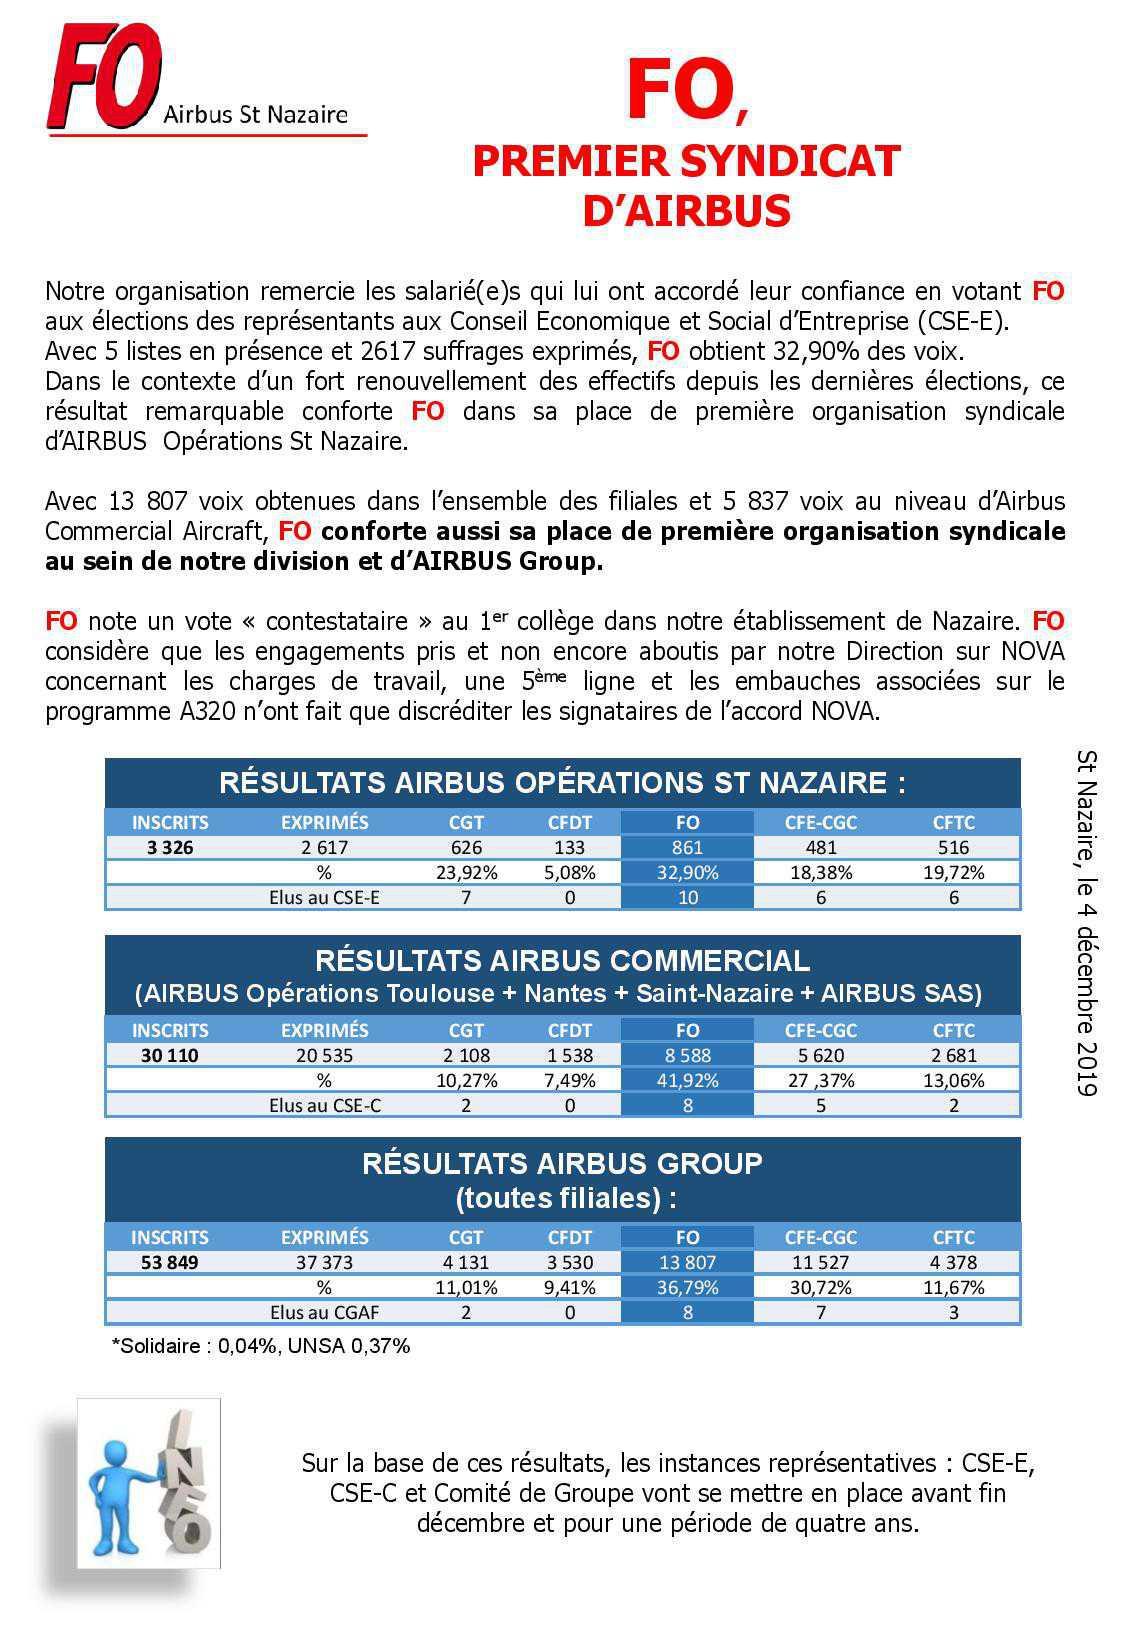 FO, Premier syndicat d' Airbus